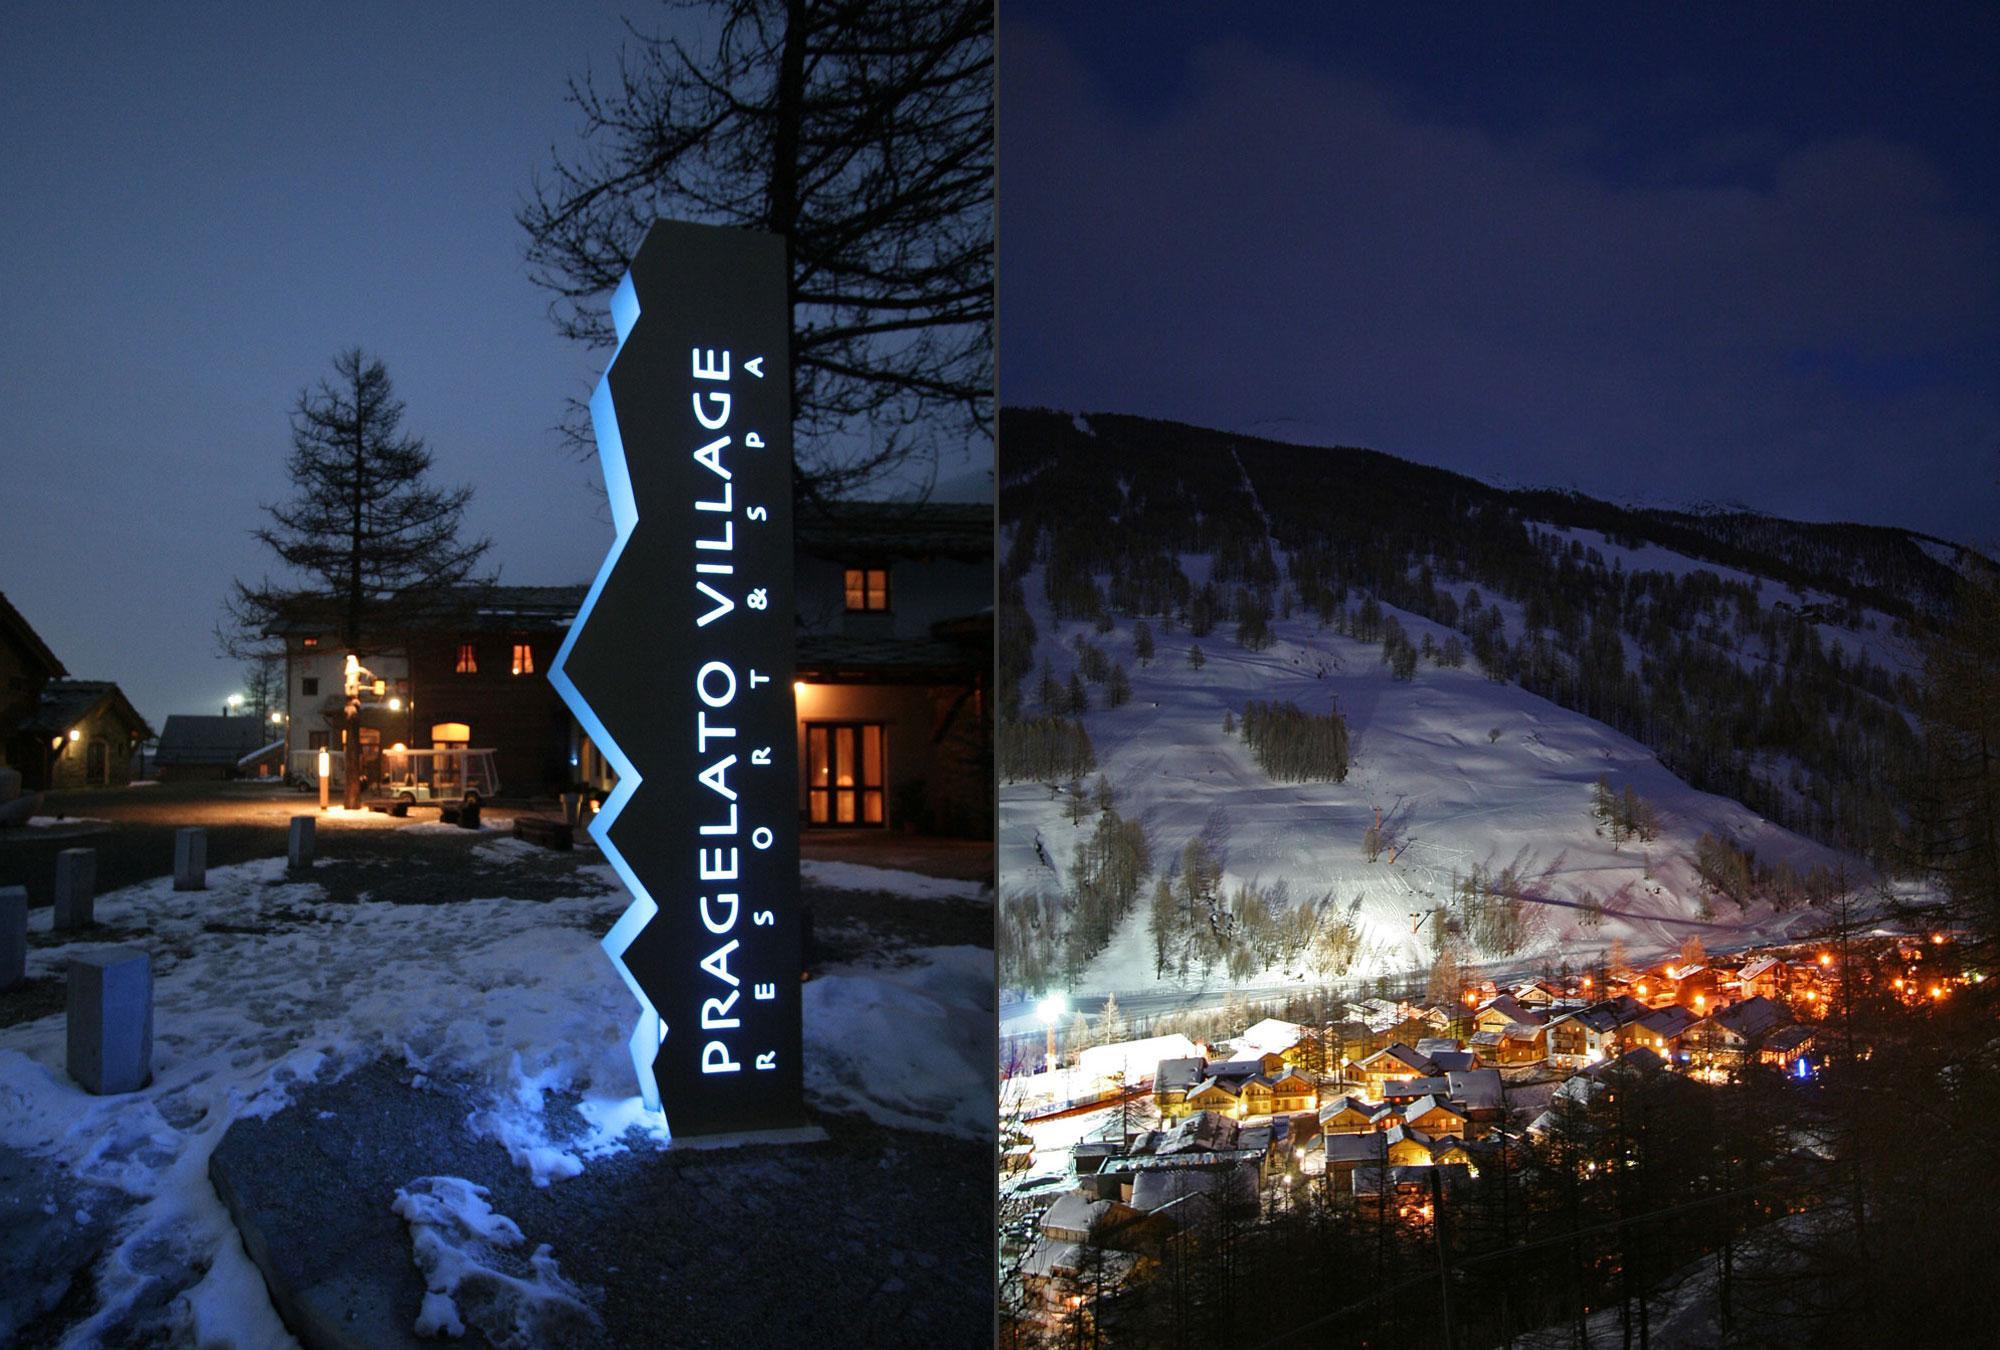 Main entrance to resort & Village nestled in the Val Troncea National Park